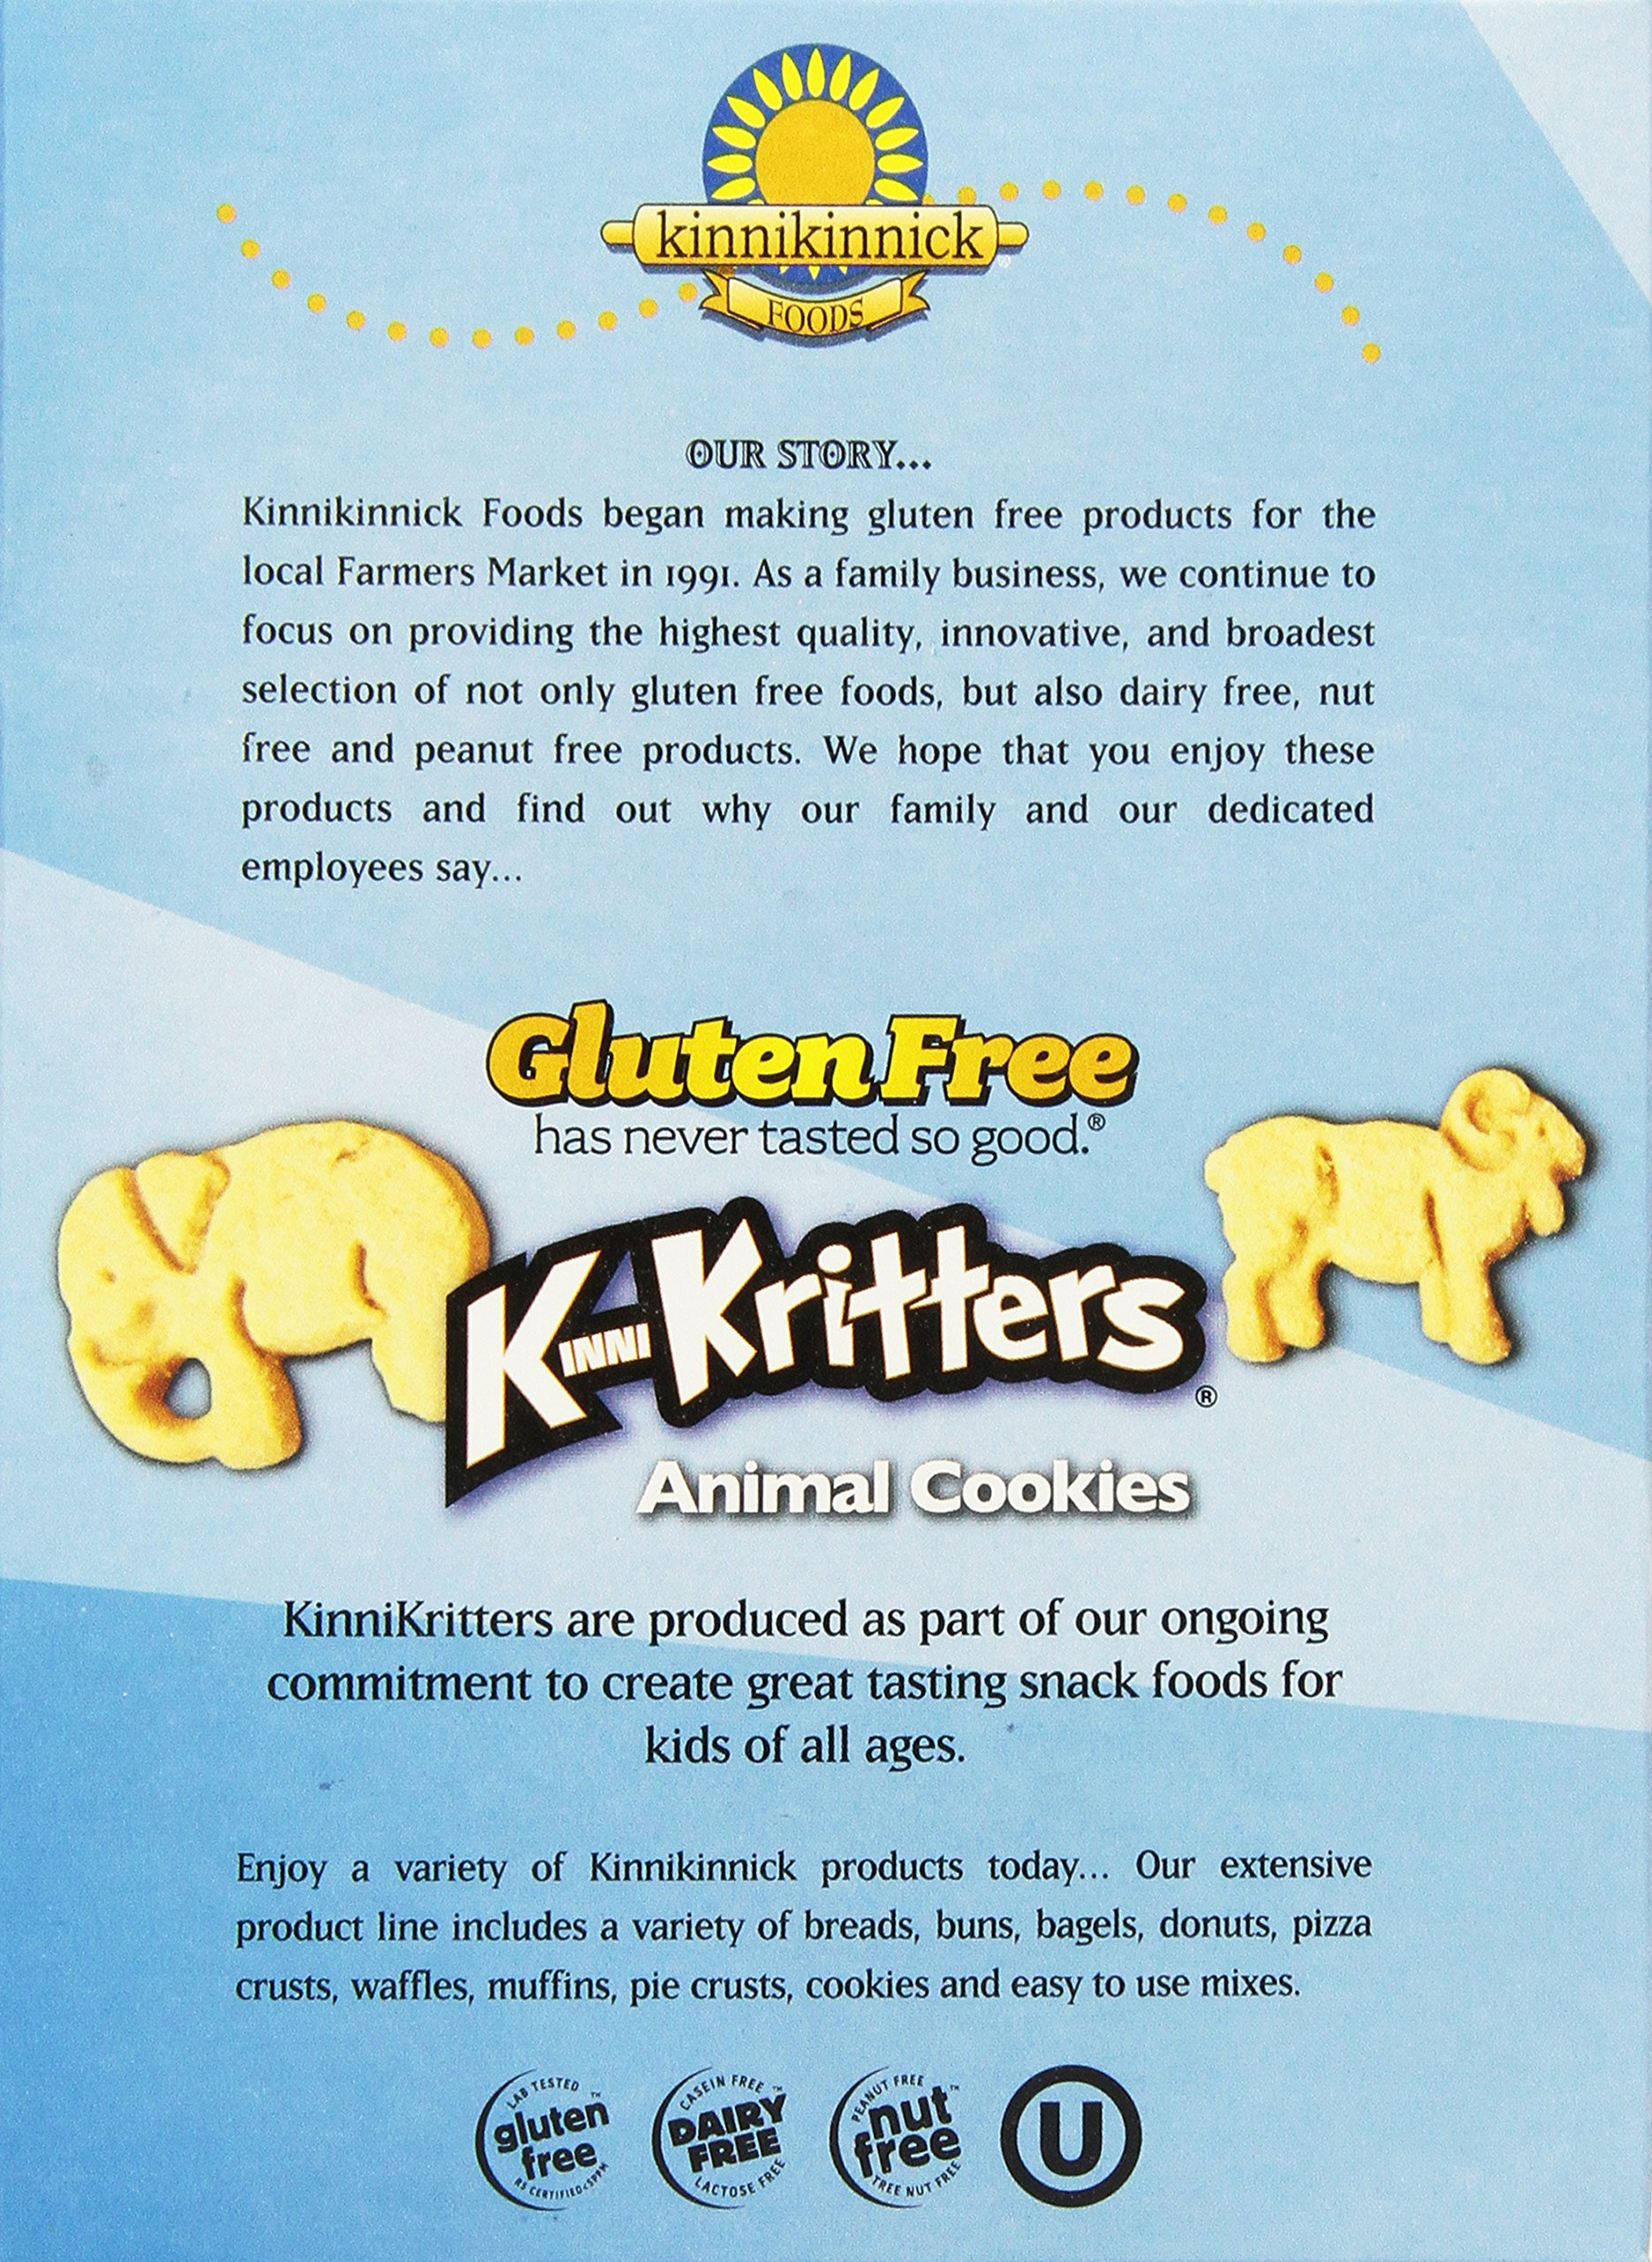 Kinnikinnick Gluten Free Animal Cookies, 8 Ounce (Pack of 6) by Kinnikinnick (Image #4)